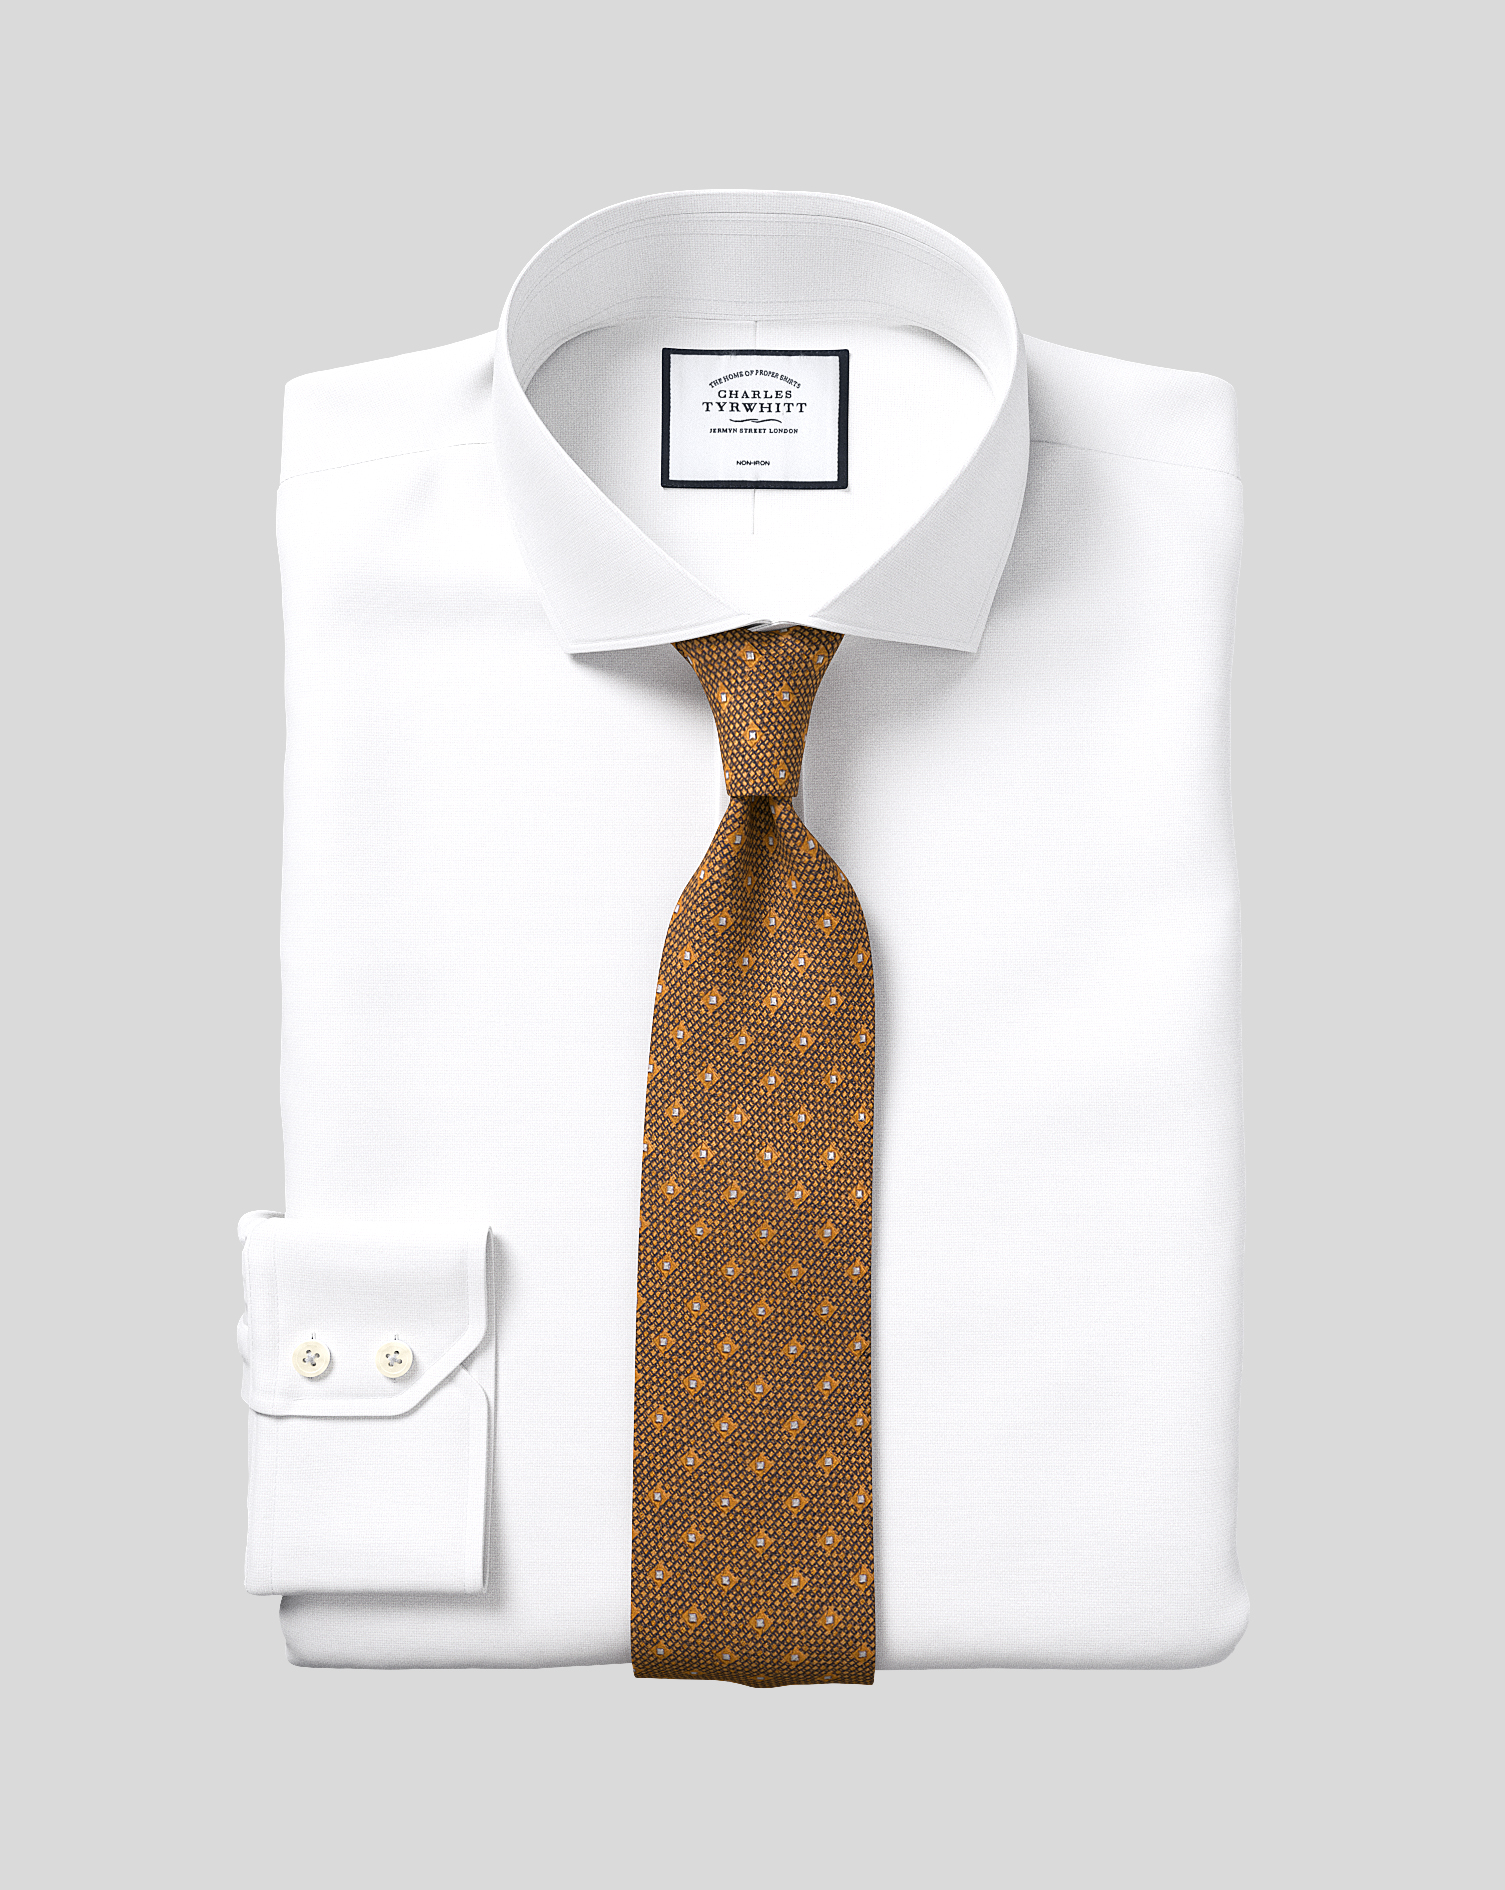 Cotton Slim Fit Non-Iron White Oxford Stretch Shirt